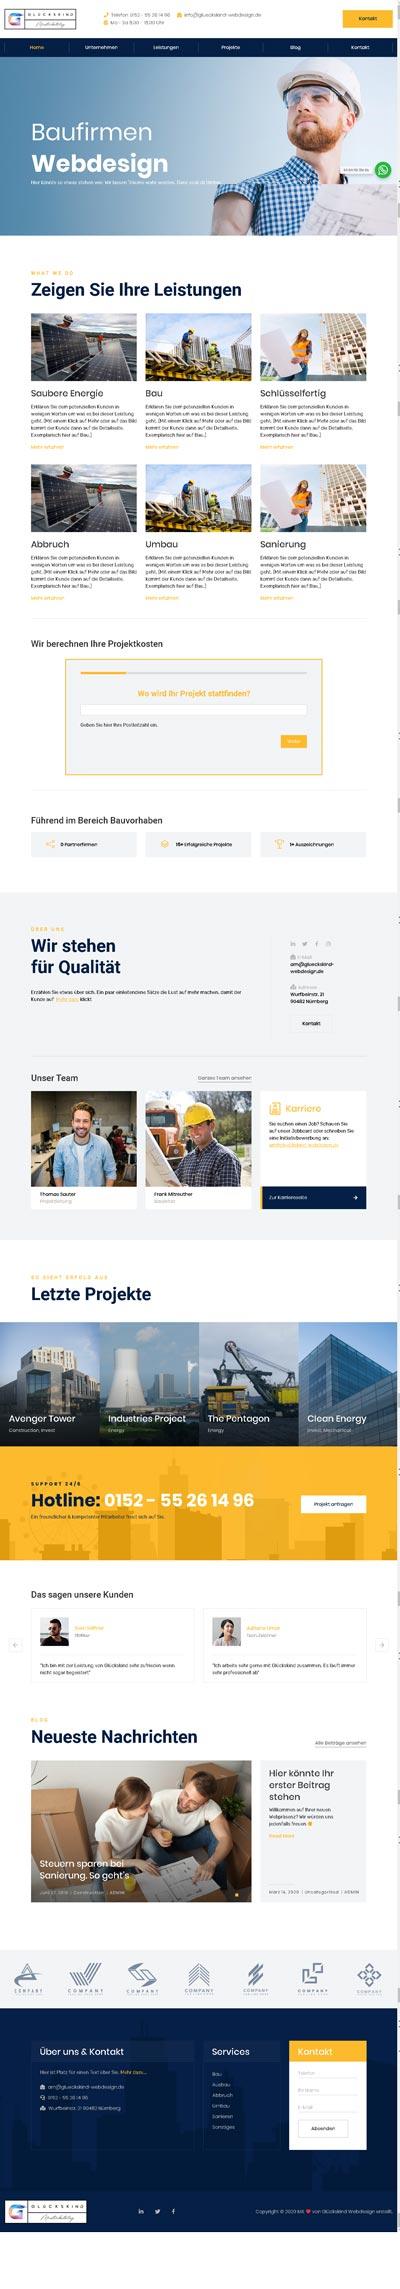 Bau Hochtief - Glückskind Webdesign Musterkatalog